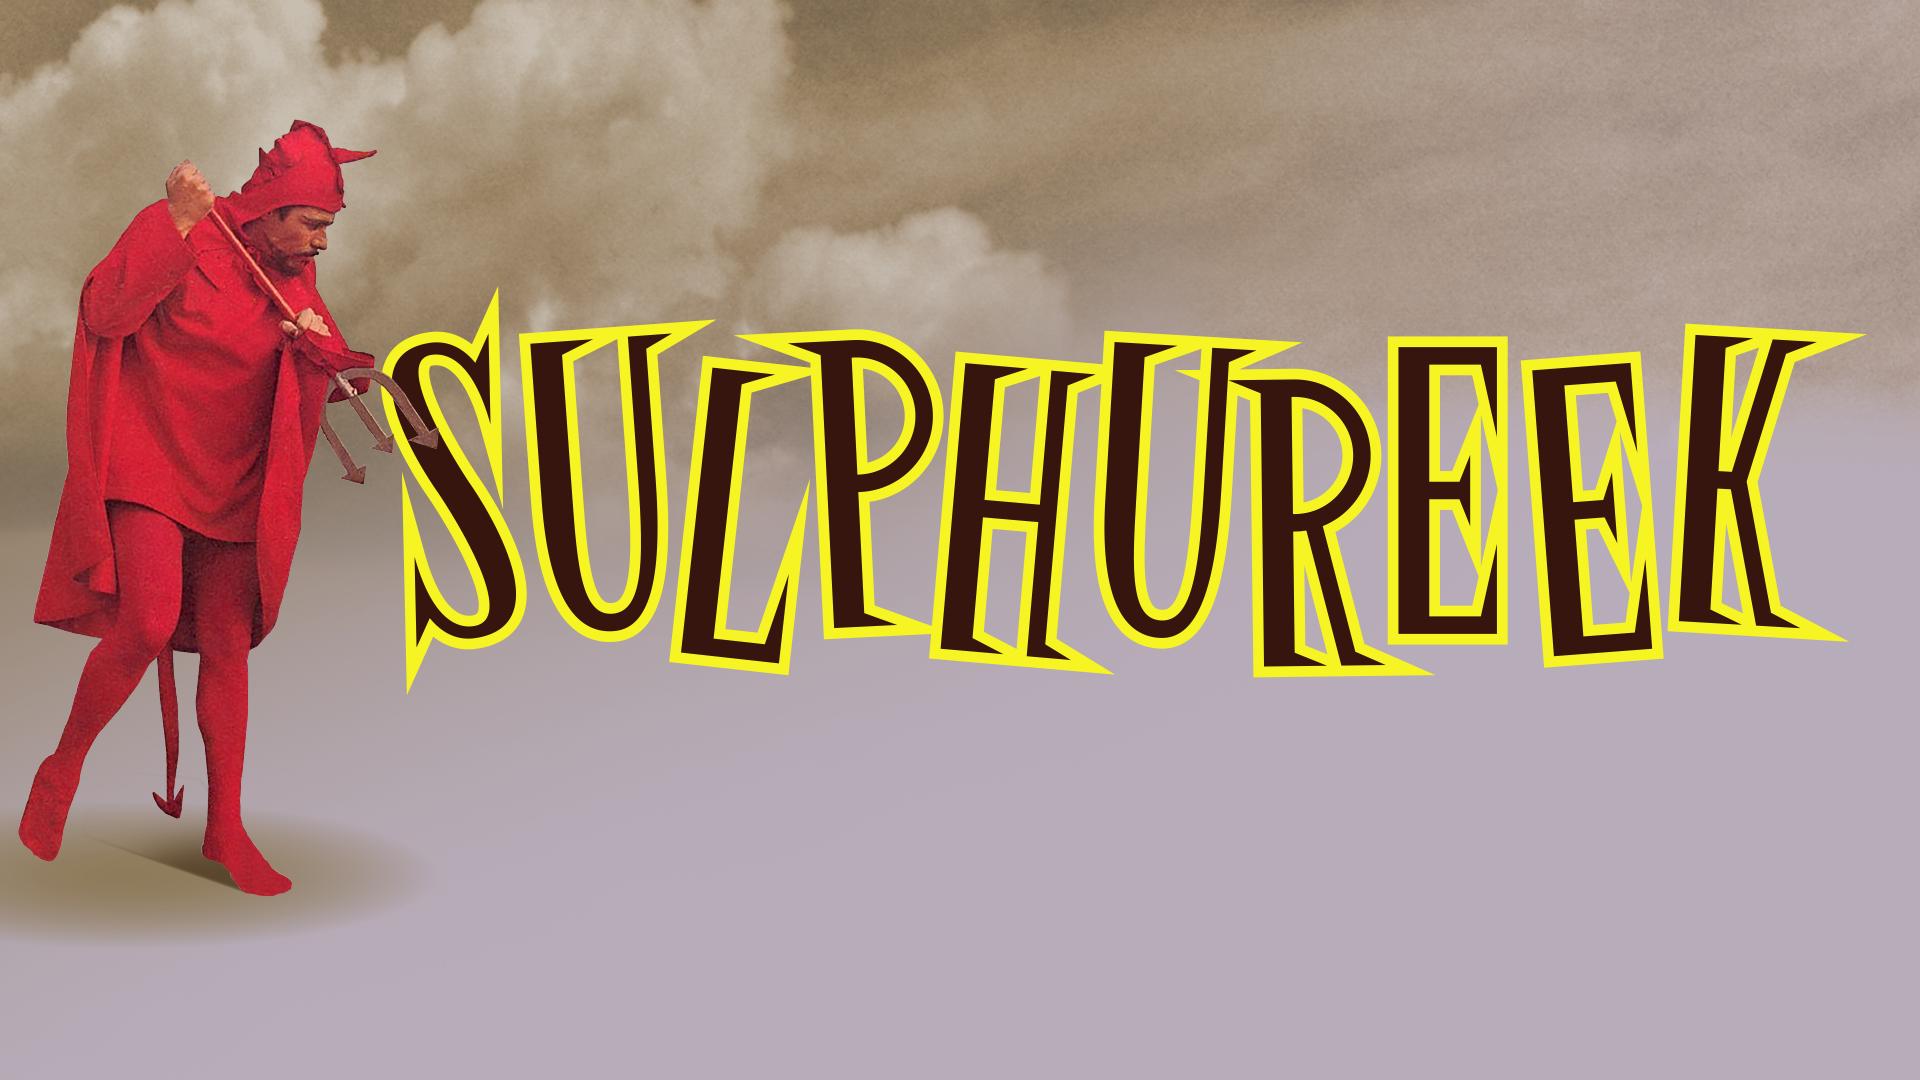 Download Sulphureek cool free fonts